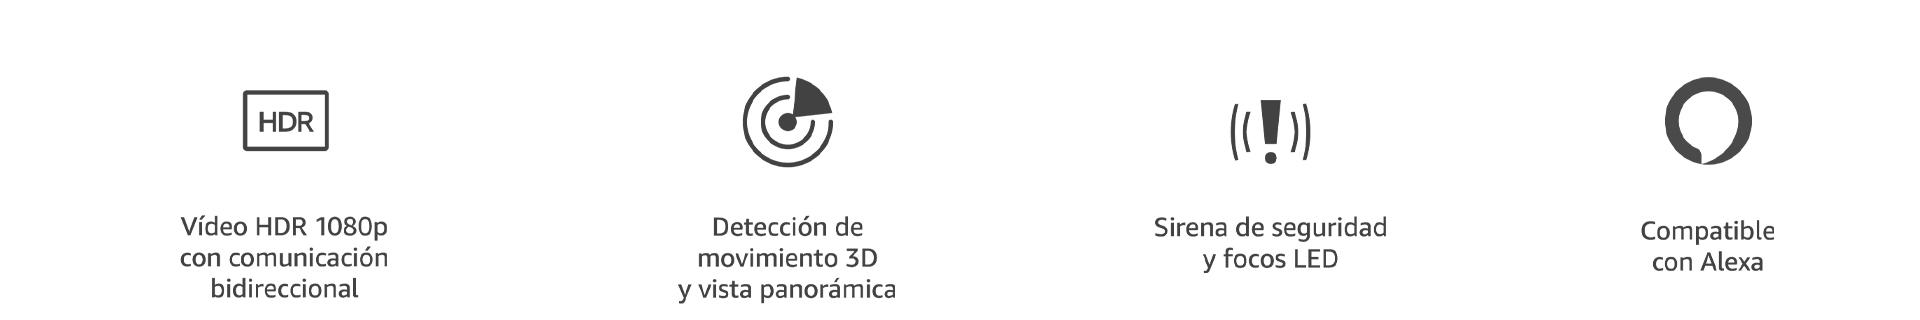 Vídeo HDR 1080p con comunicación bidireccional